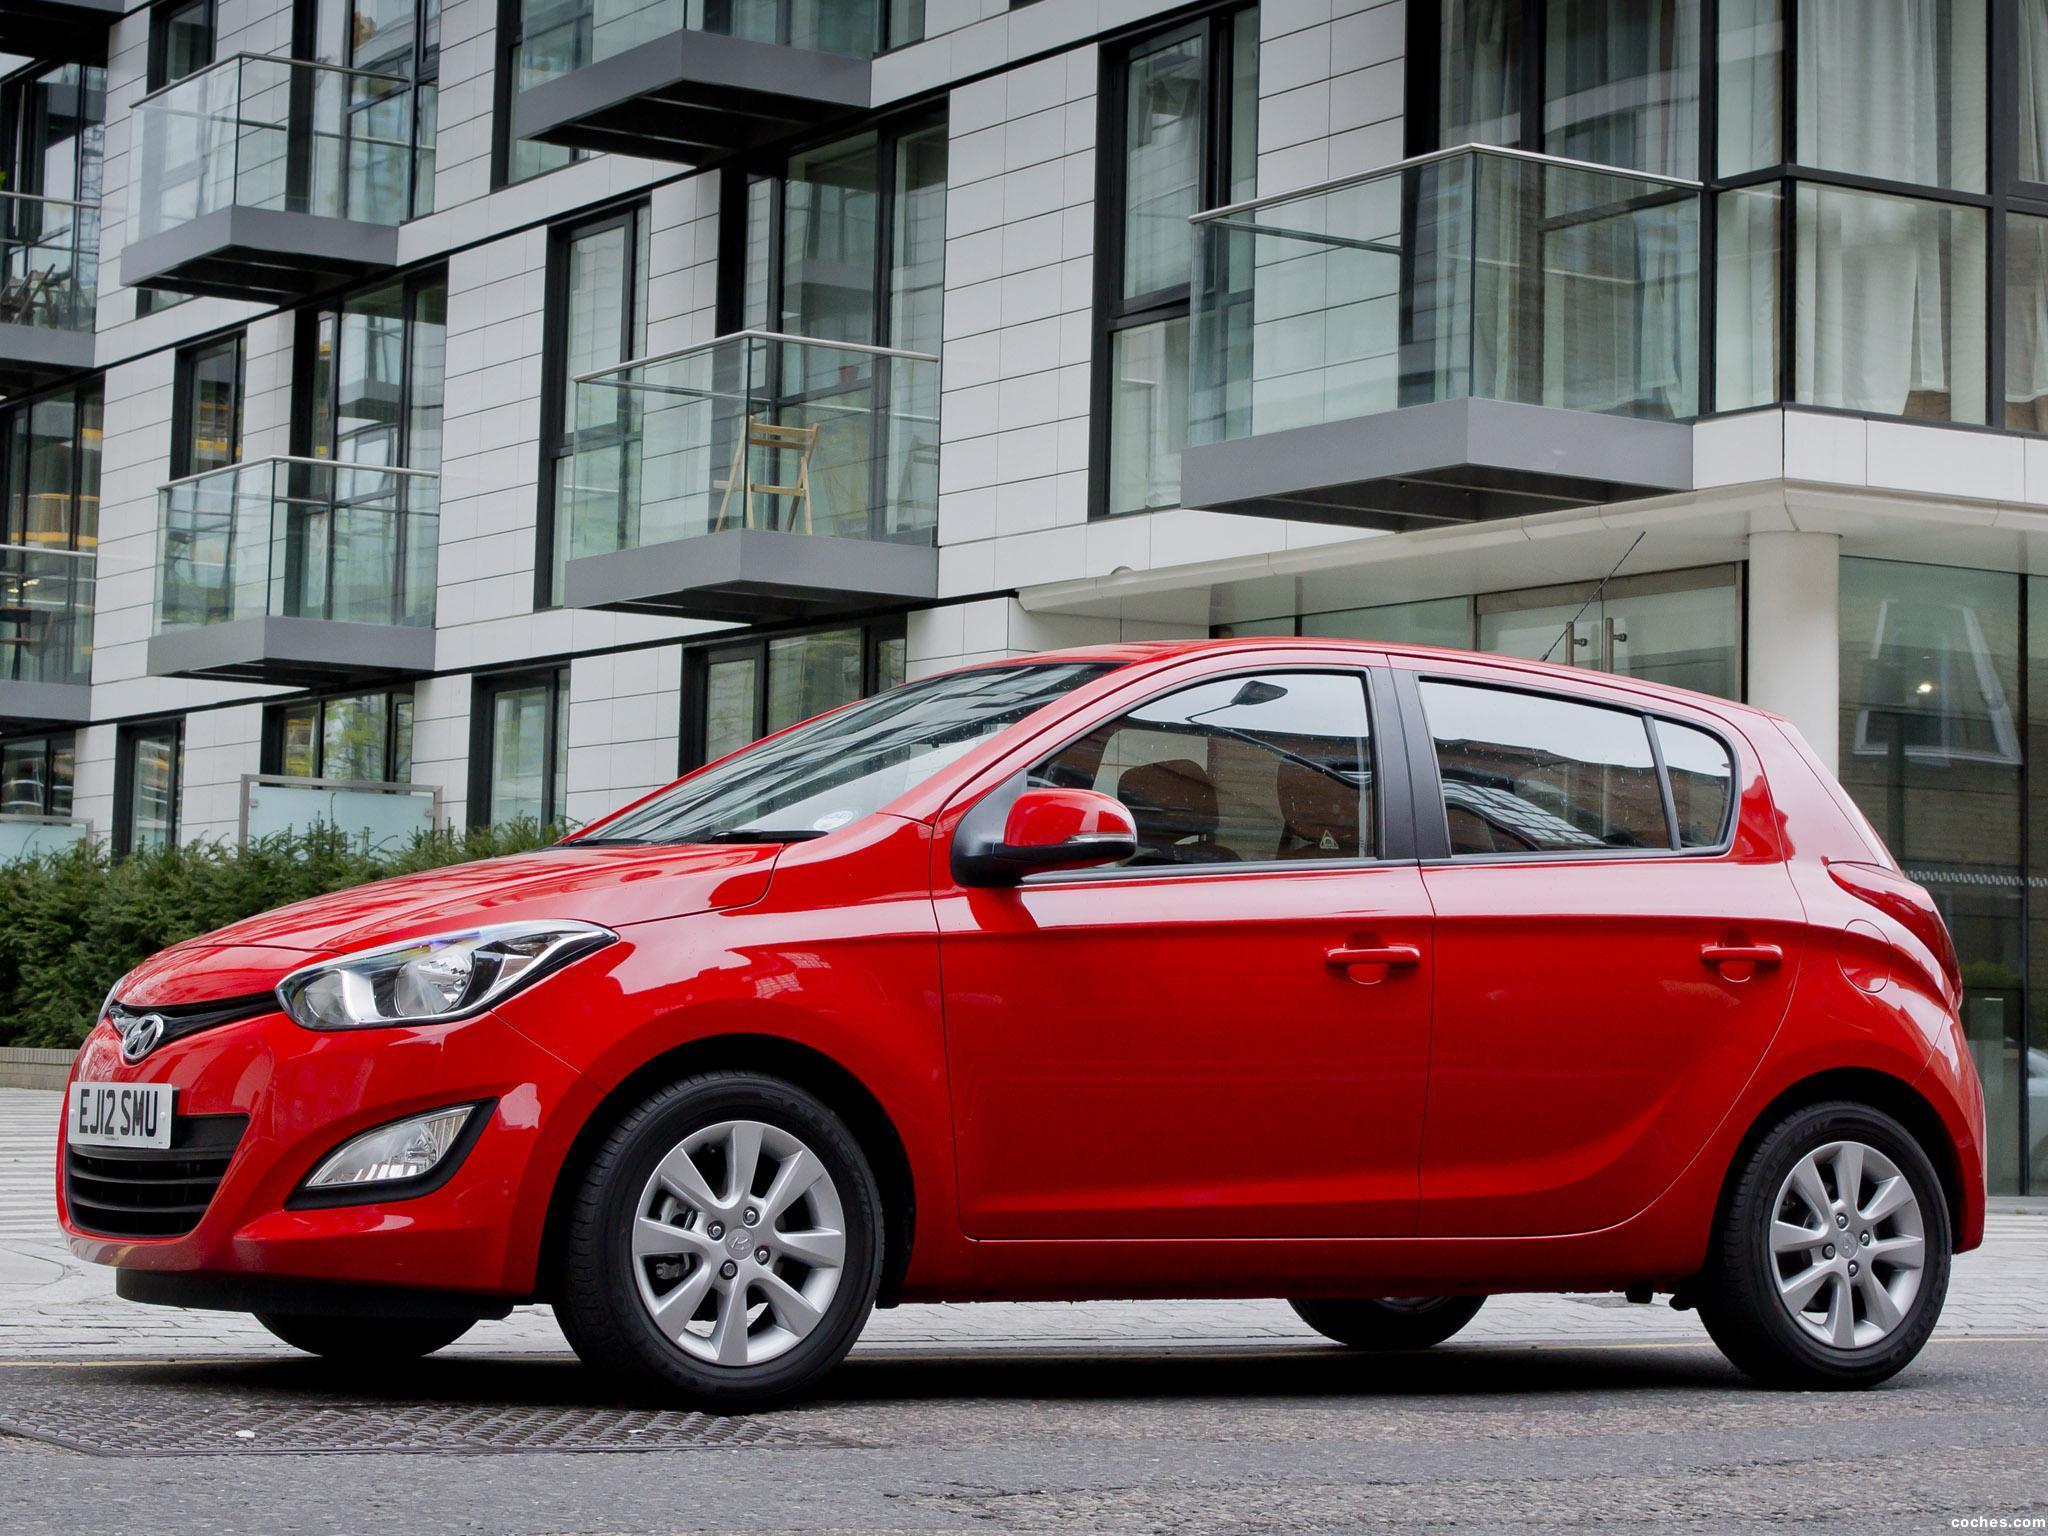 Foto 2 de Hyundai i20 UK 2012